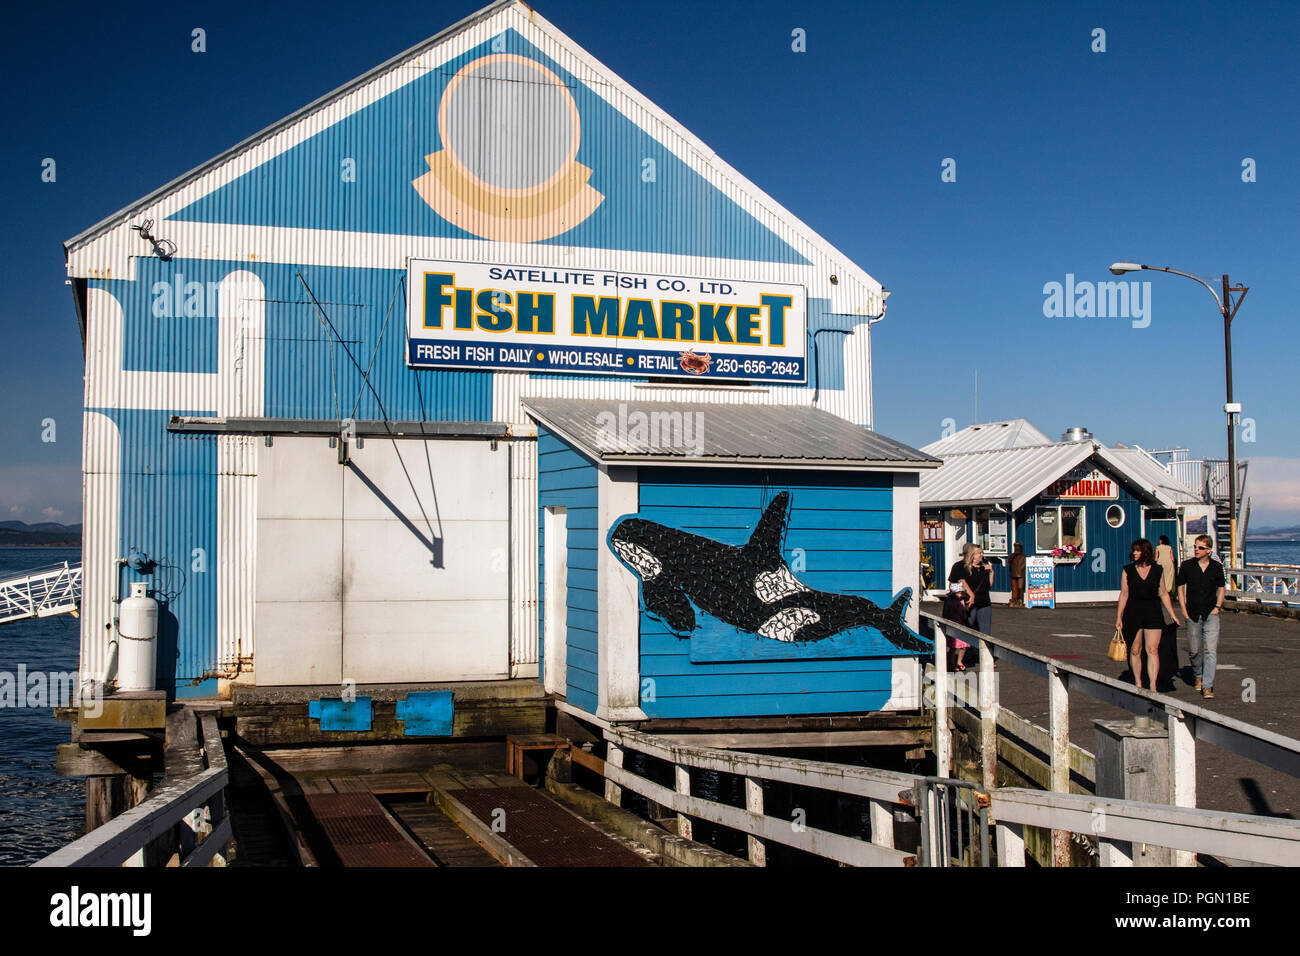 Satellite Fish Co, Ltd. Fish Market - Sidney, Vancouver Island, British Columbia, Canada - Stock Image